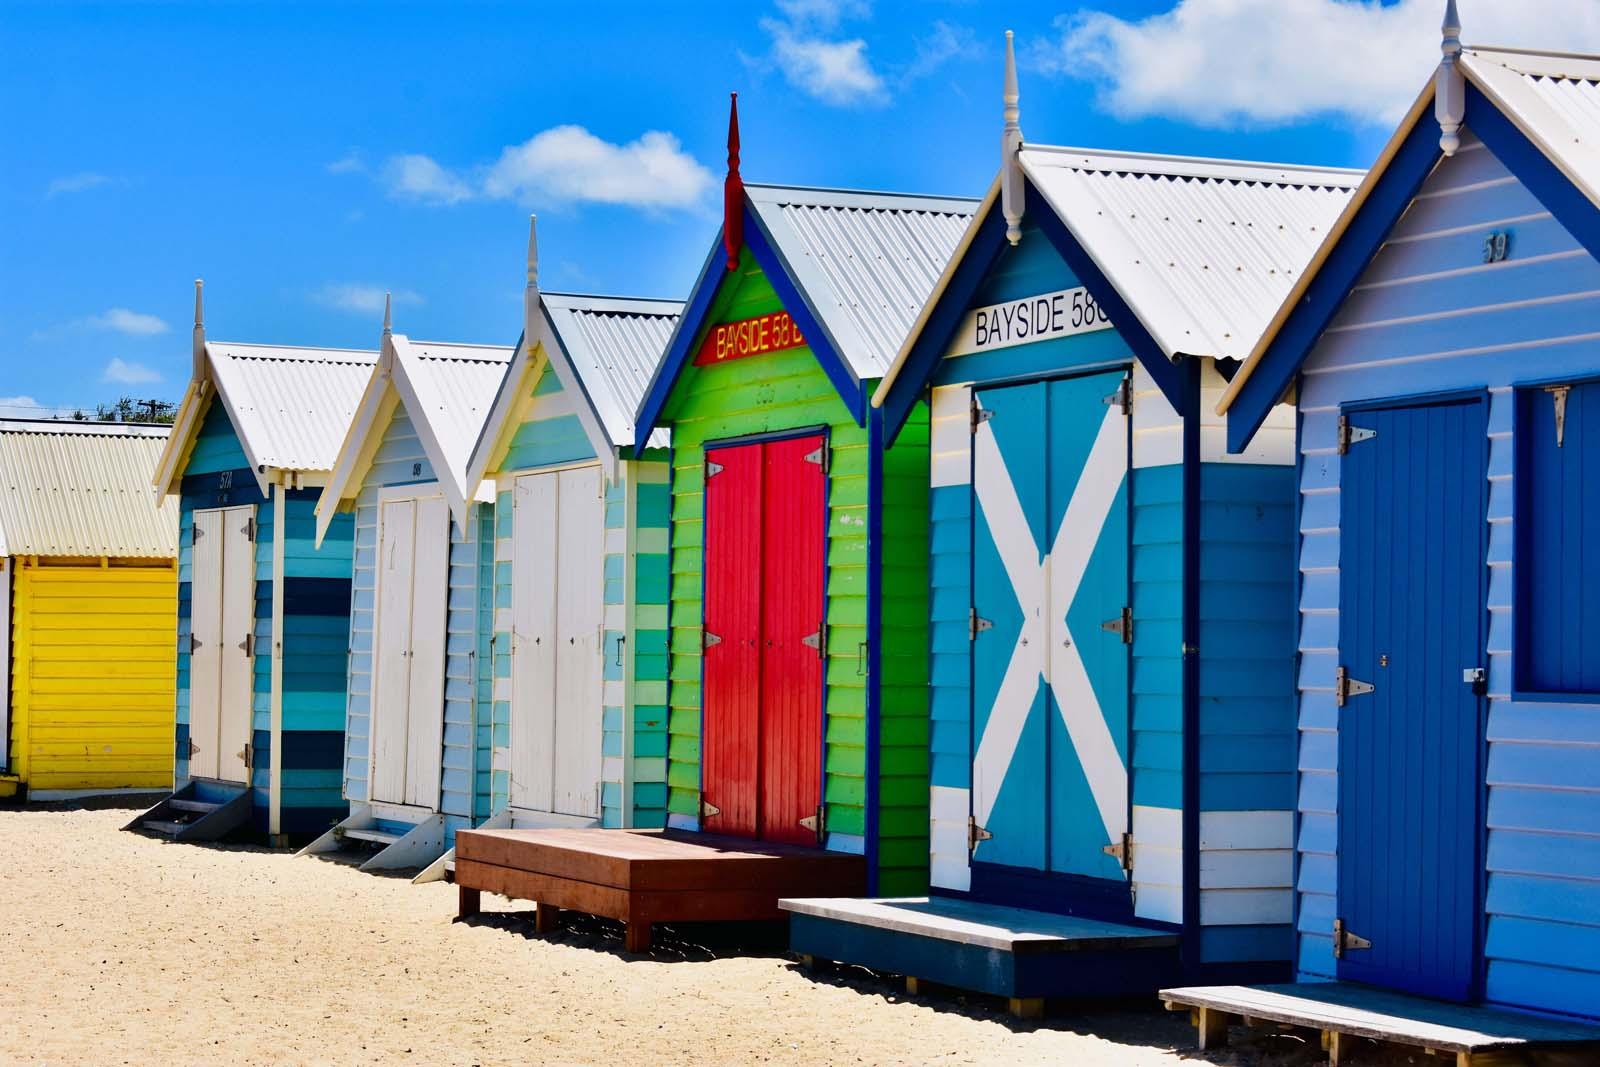 brighton beach, brighton beach melbourne, brighton beach boxes, brighton bathing boxes, beaches in melbourne, brighton beach huts